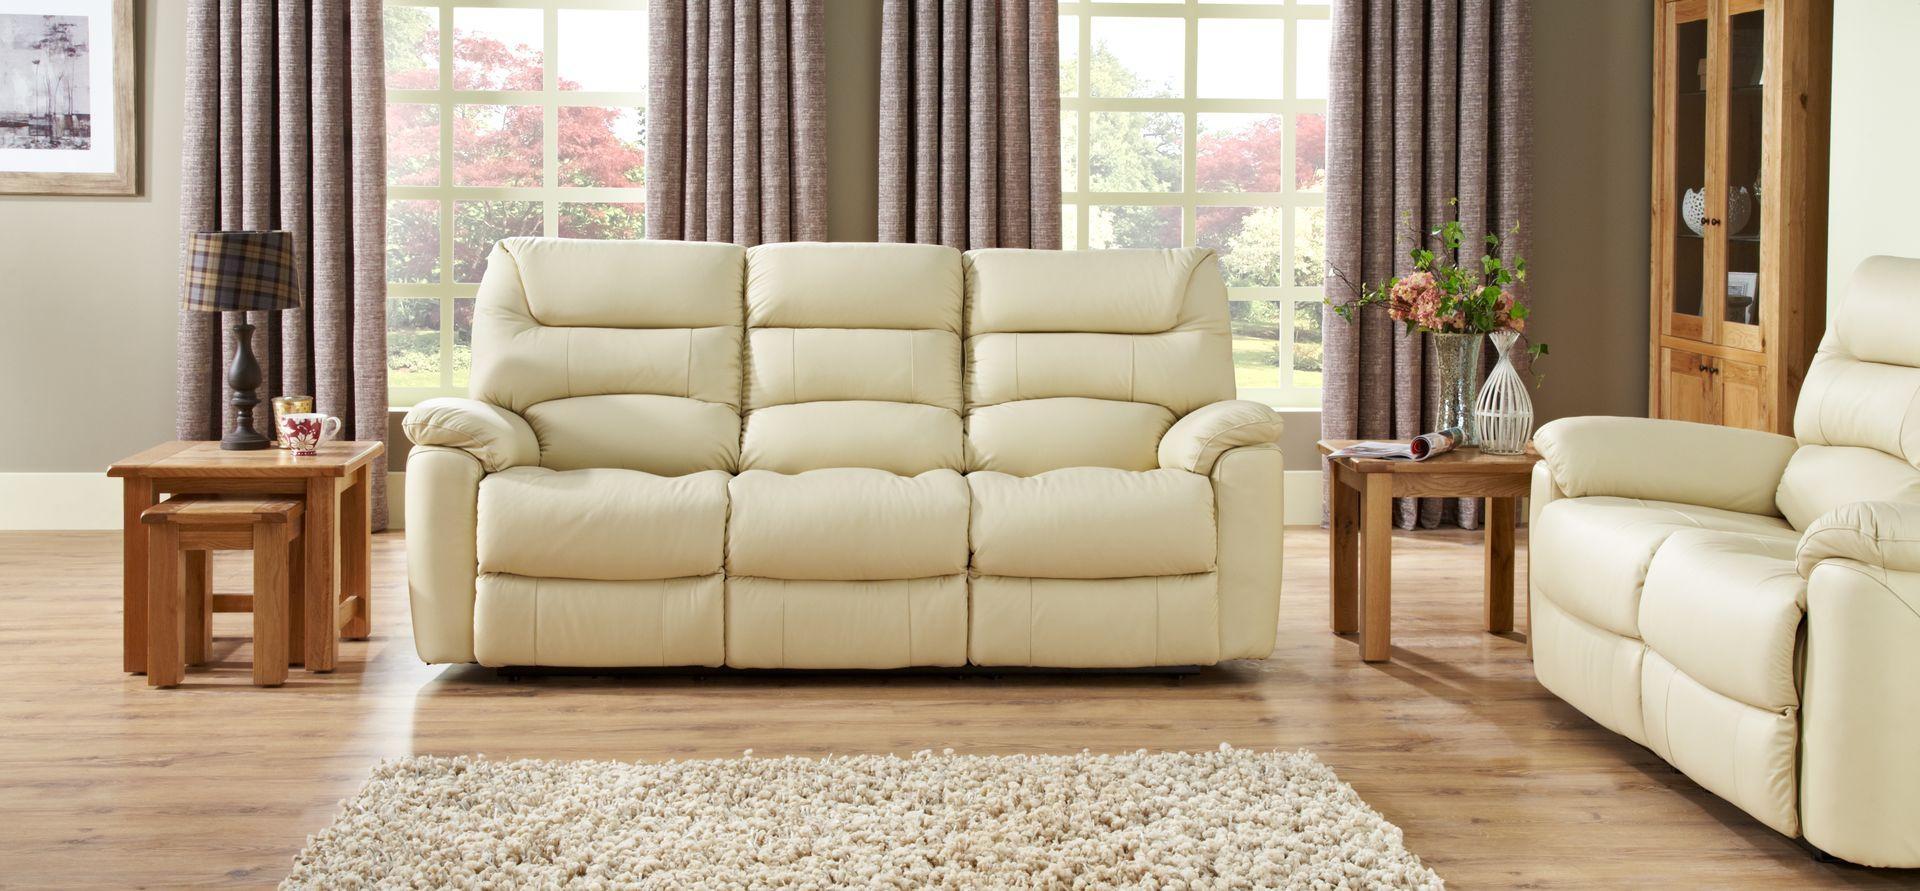 La Z Boy Manhattan 3 Seater Manual Recliner Sofa | Scs Within Lazy Boy Manhattan Sofas (View 5 of 21)